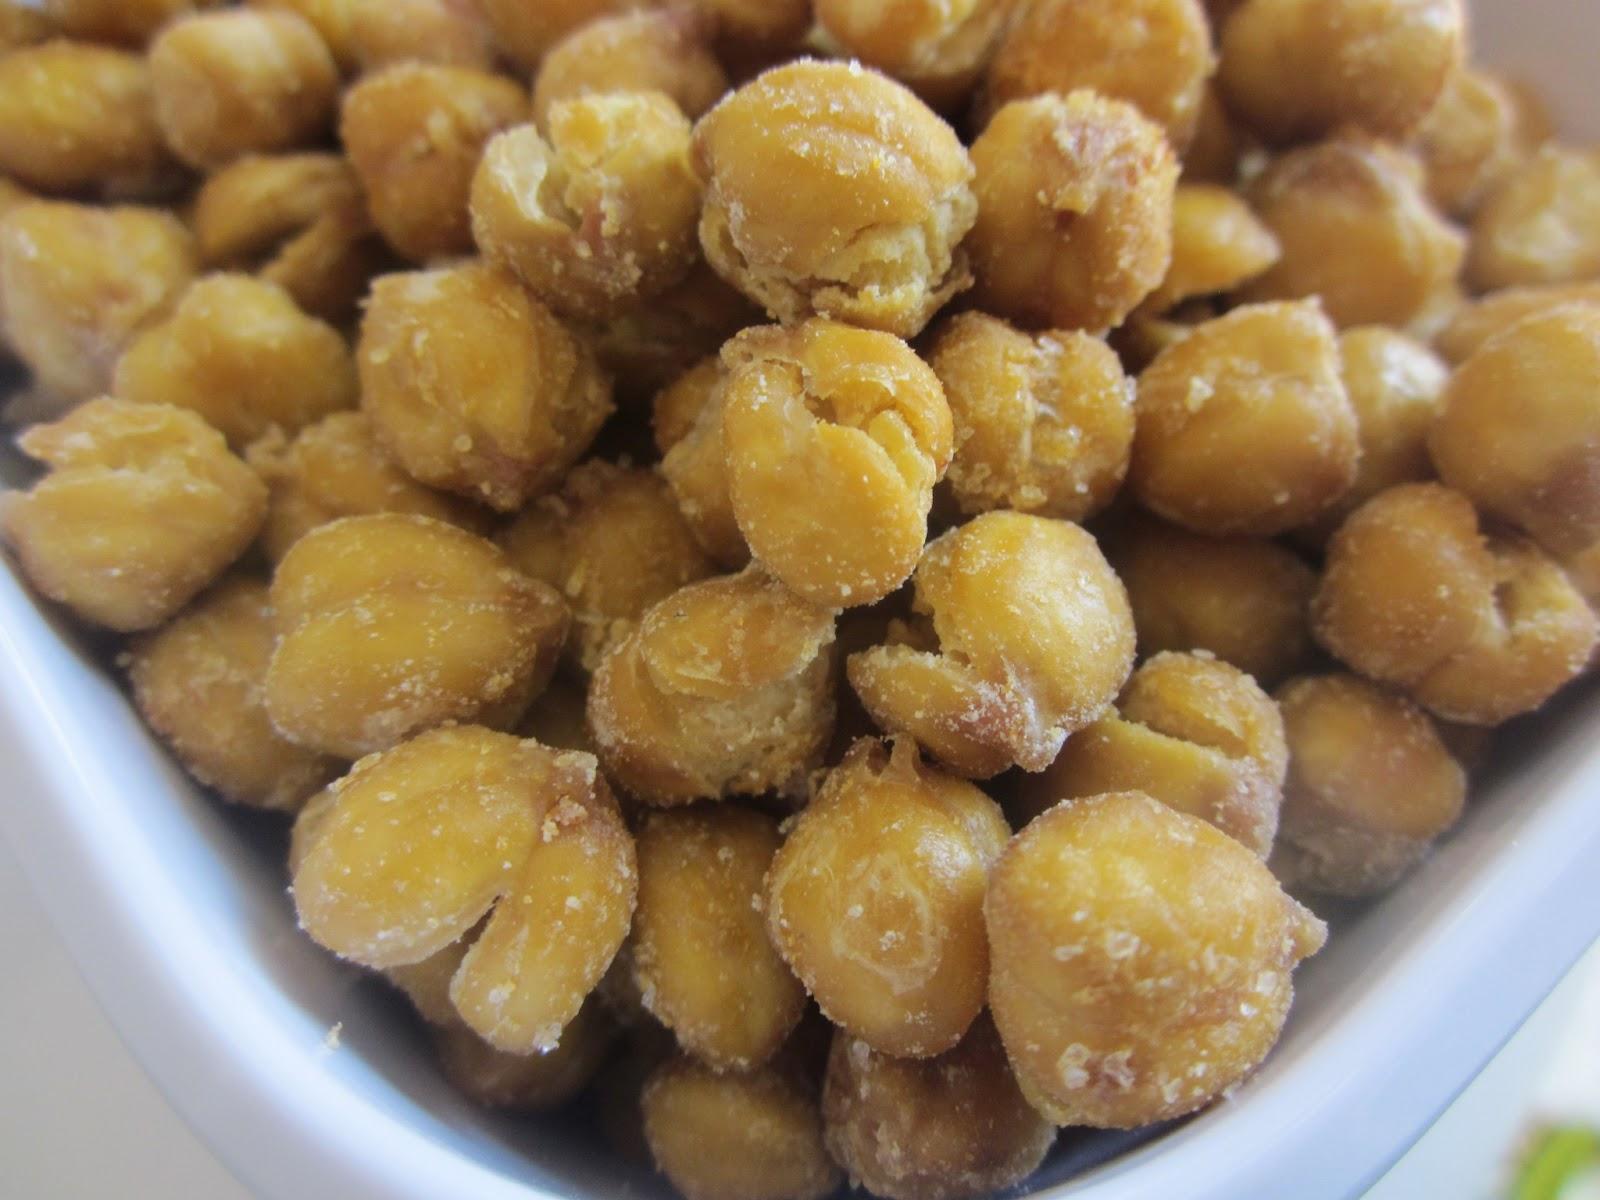 Baked Snacks Homemade Healthy 25